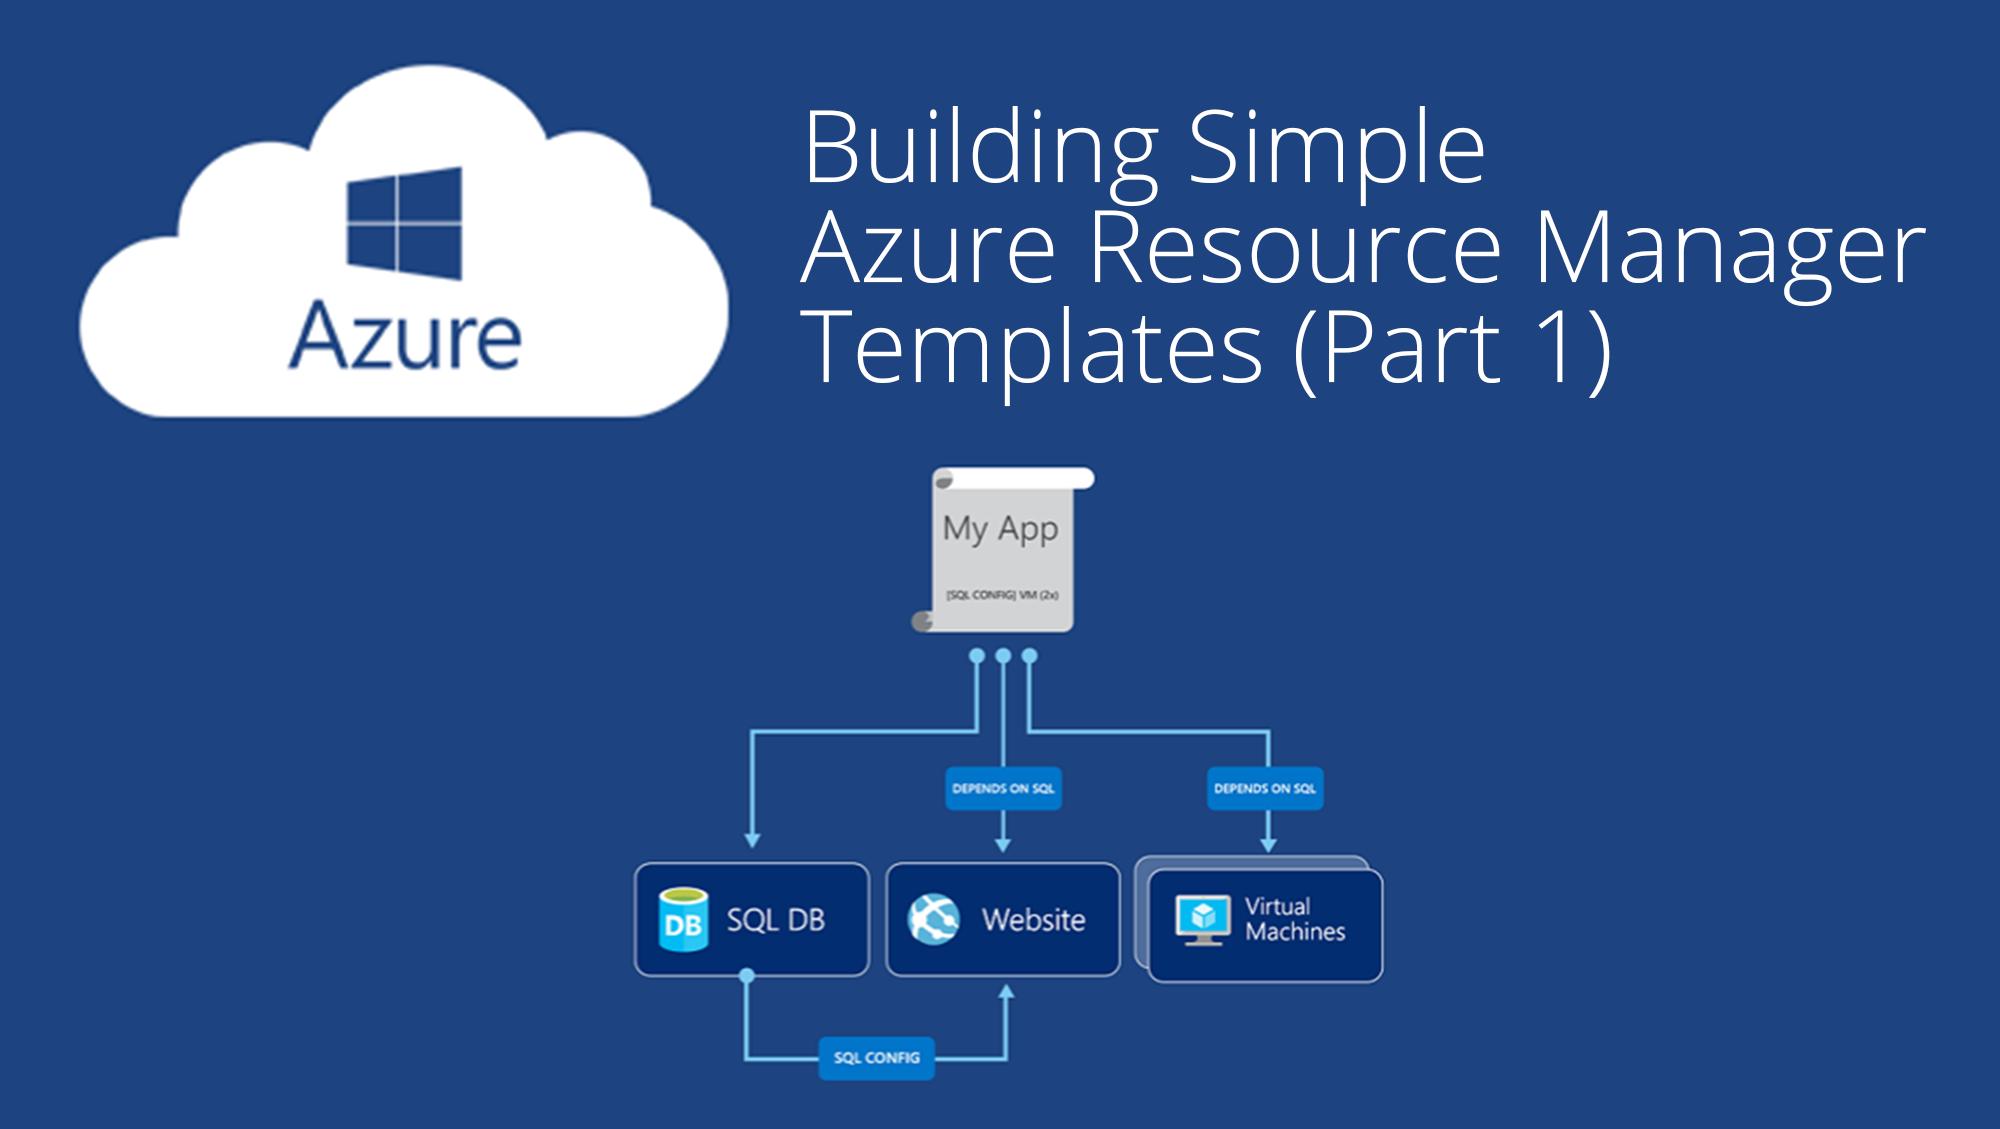 Building simple azure resource manager templates part 1 maxwellsz